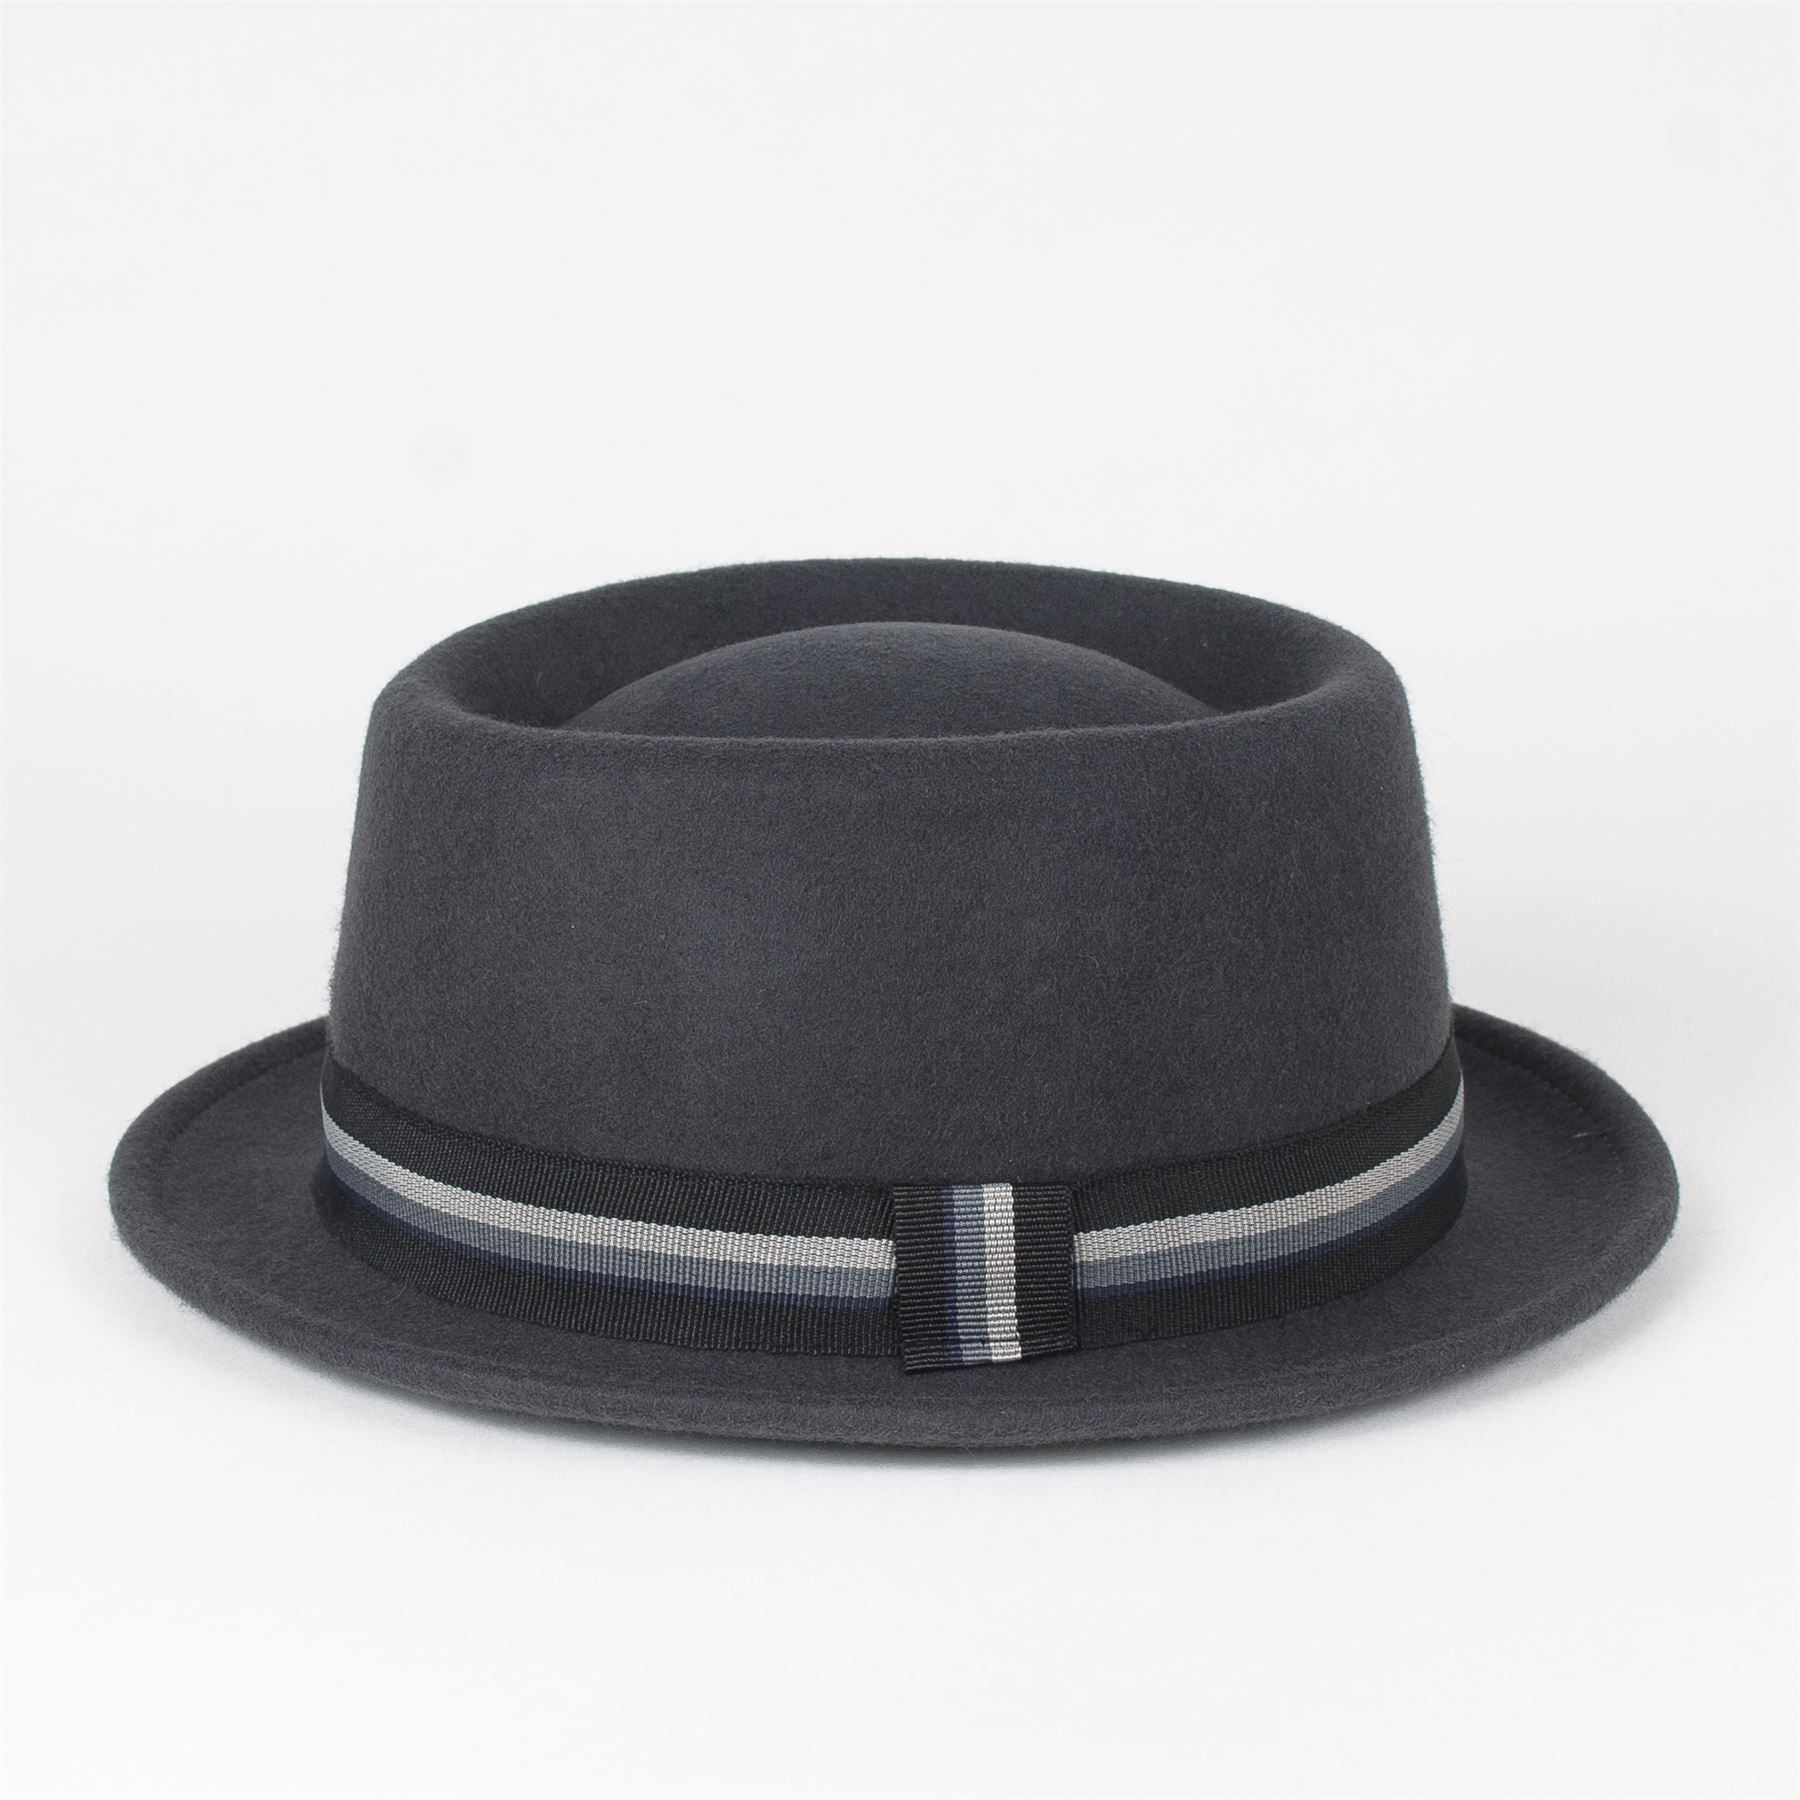 e742da886a7 Stylish 100% Wool Pork Pie Hat Waterproof   Crushable